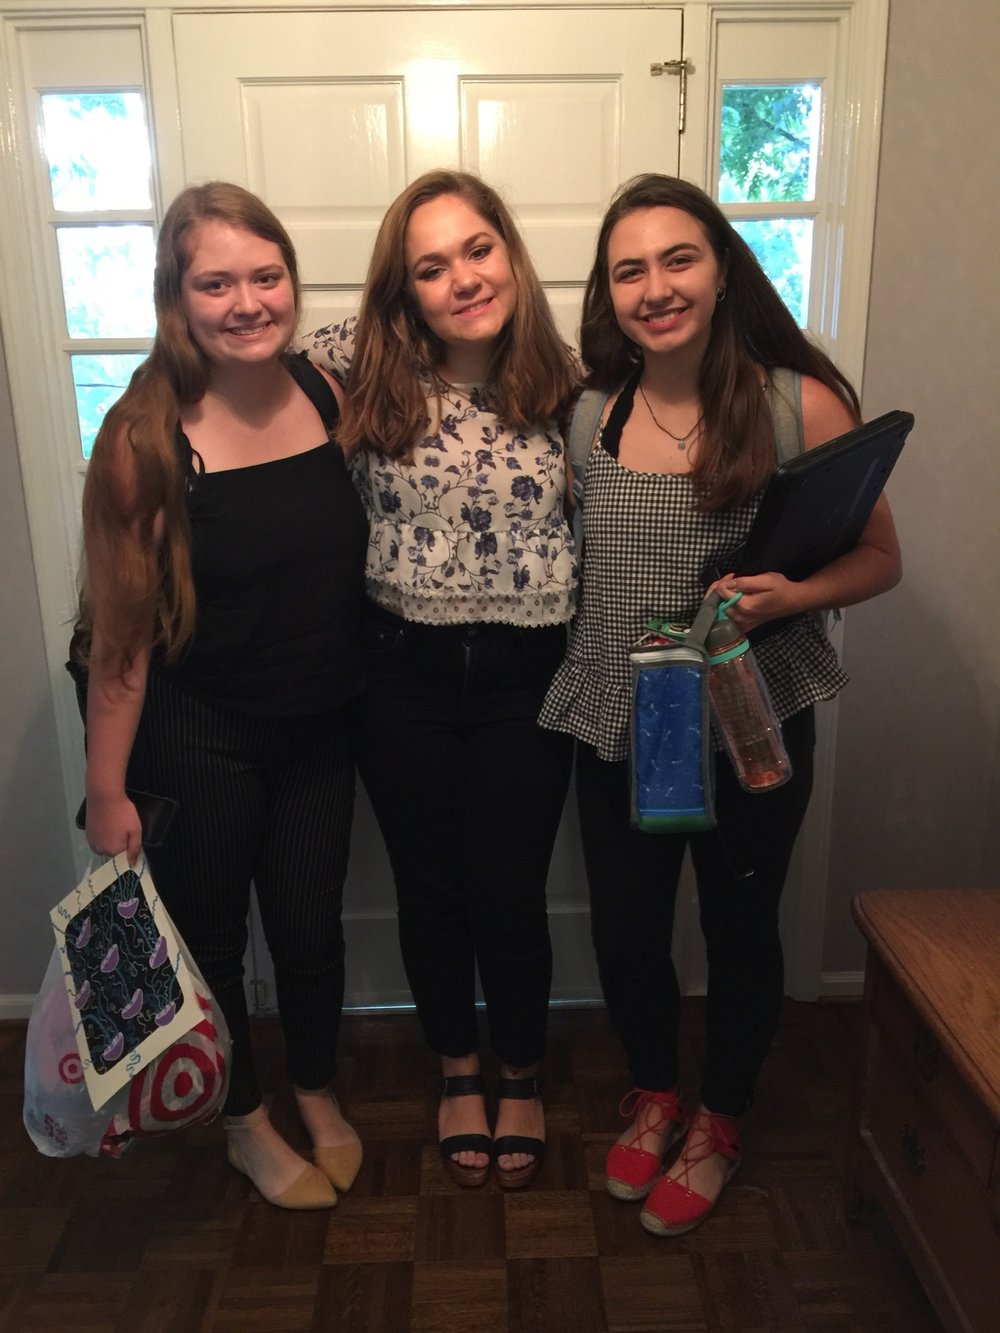 Annabelle, Anna and Kaytie.